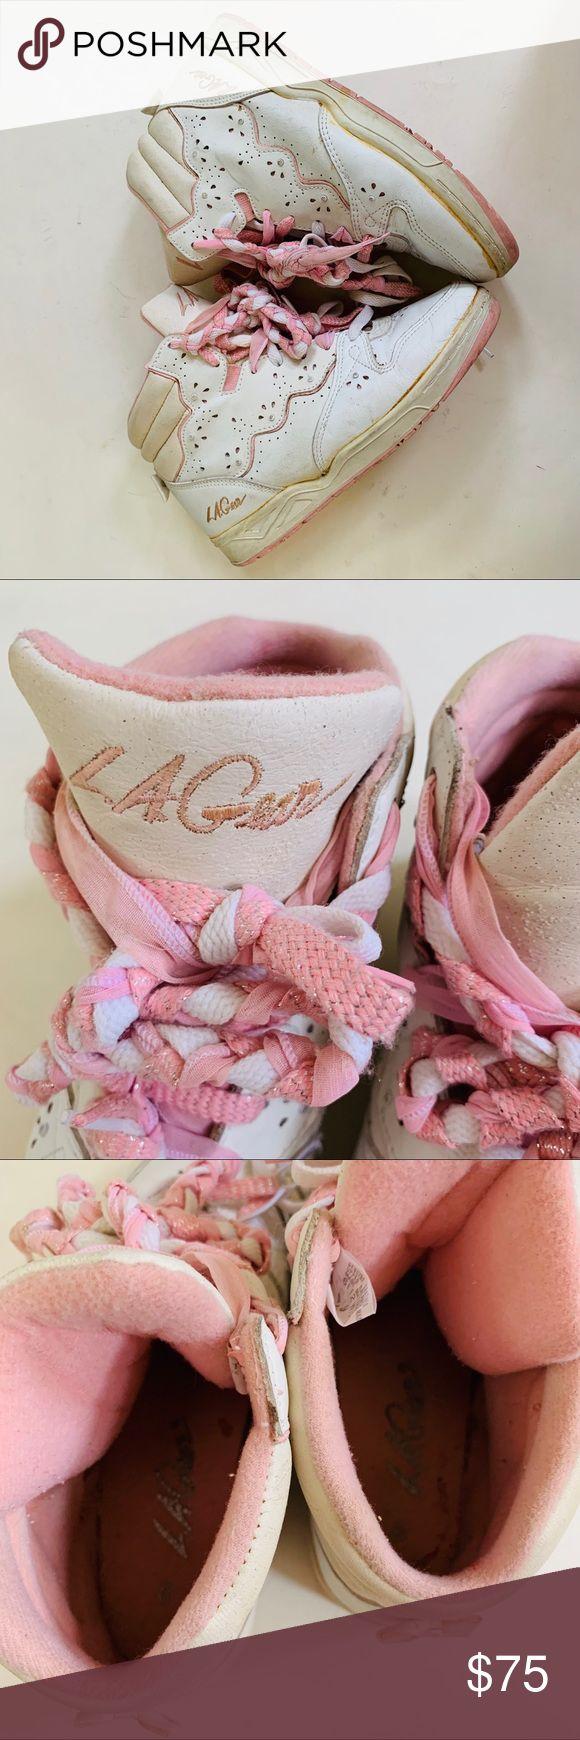 ?LA.GEAR VINTAGE RARE  80s pink white hi-tops 9 Very rare find ?   Vintage…